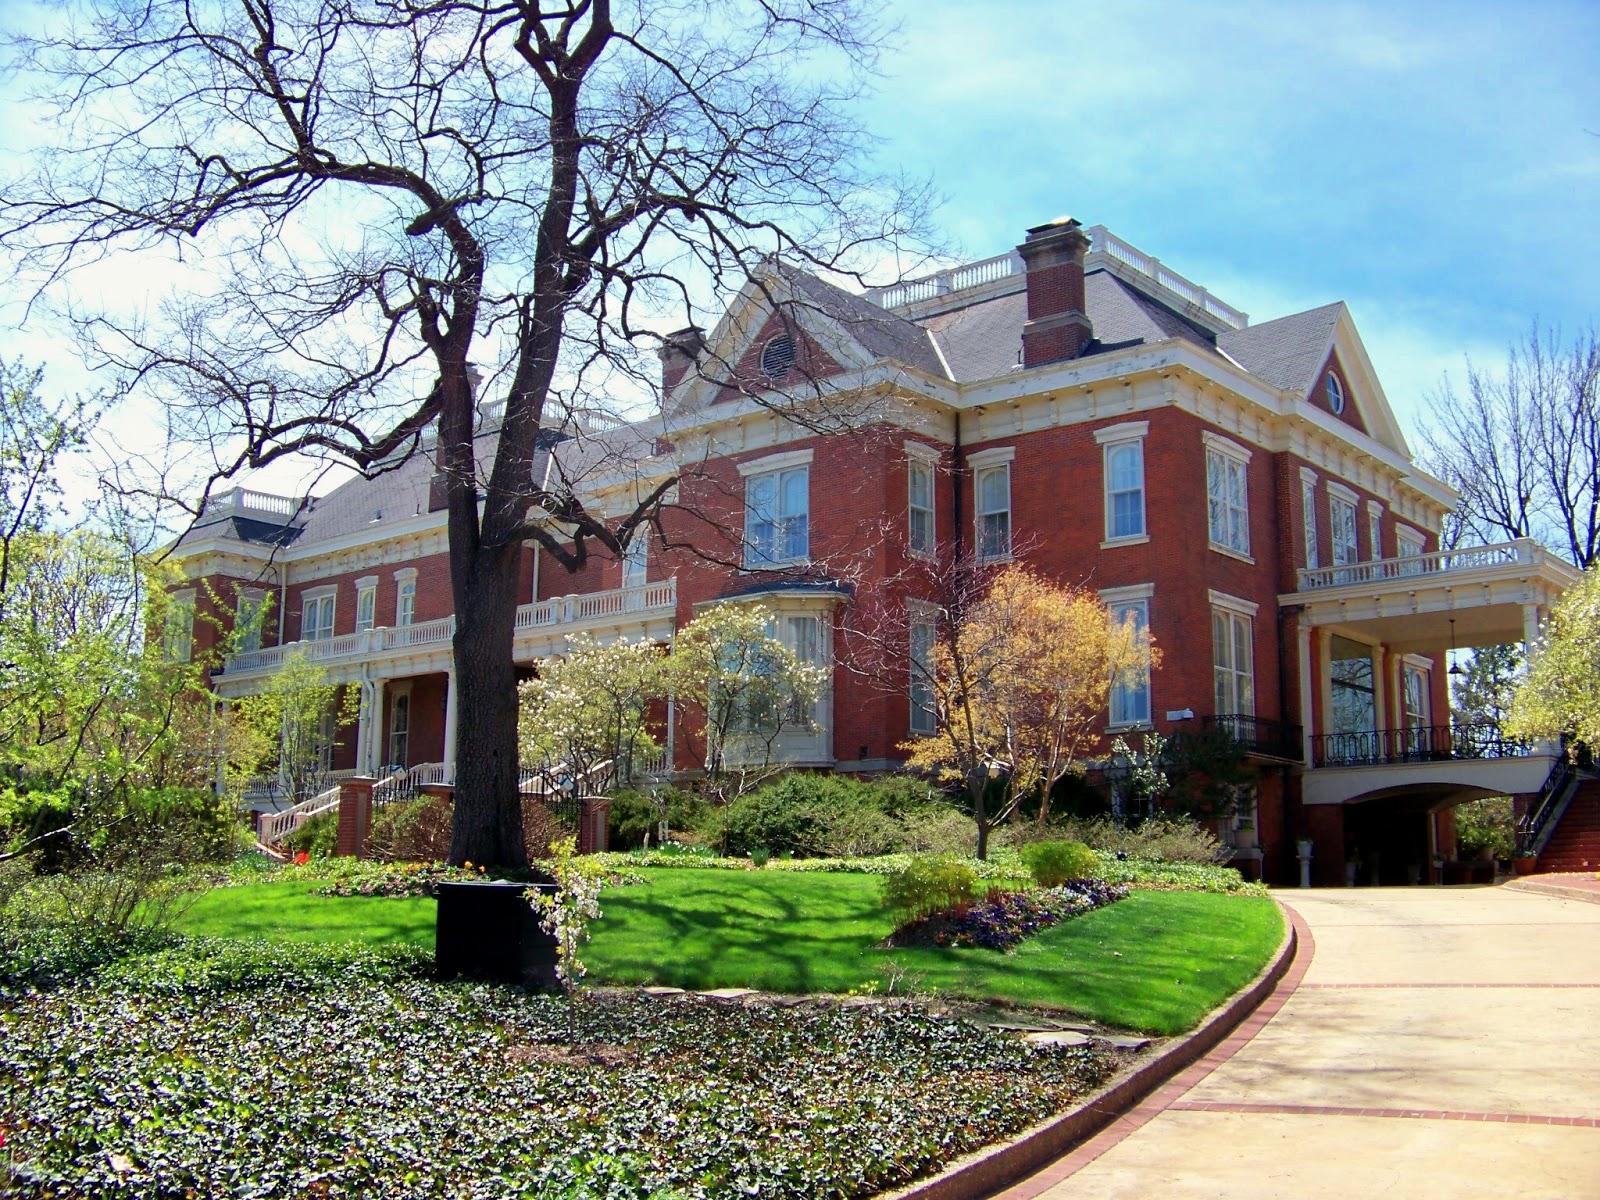 Illinois Governor's Mansion